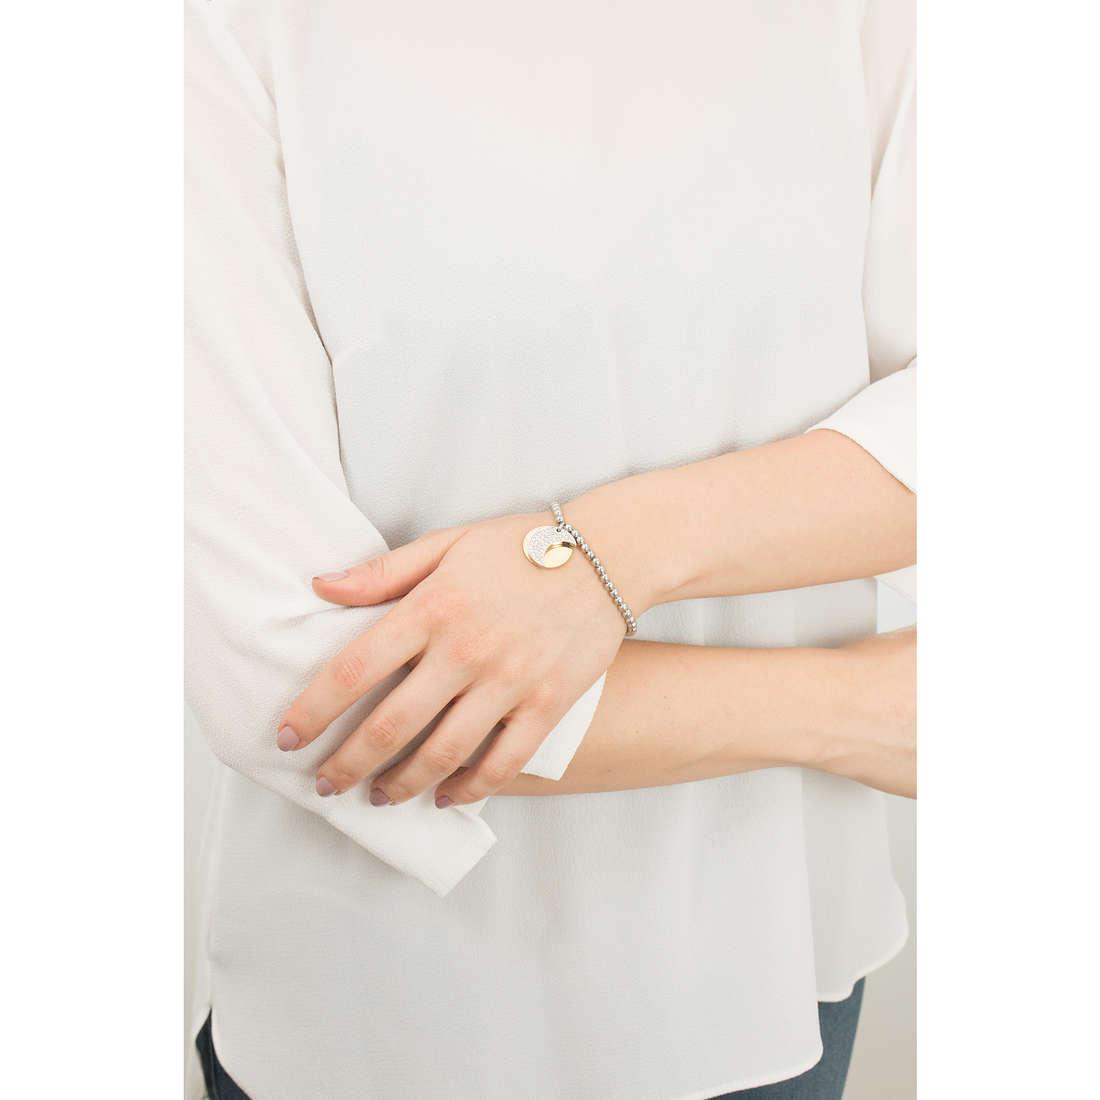 Sagapò bracciali Fortune donna SFO15 indosso